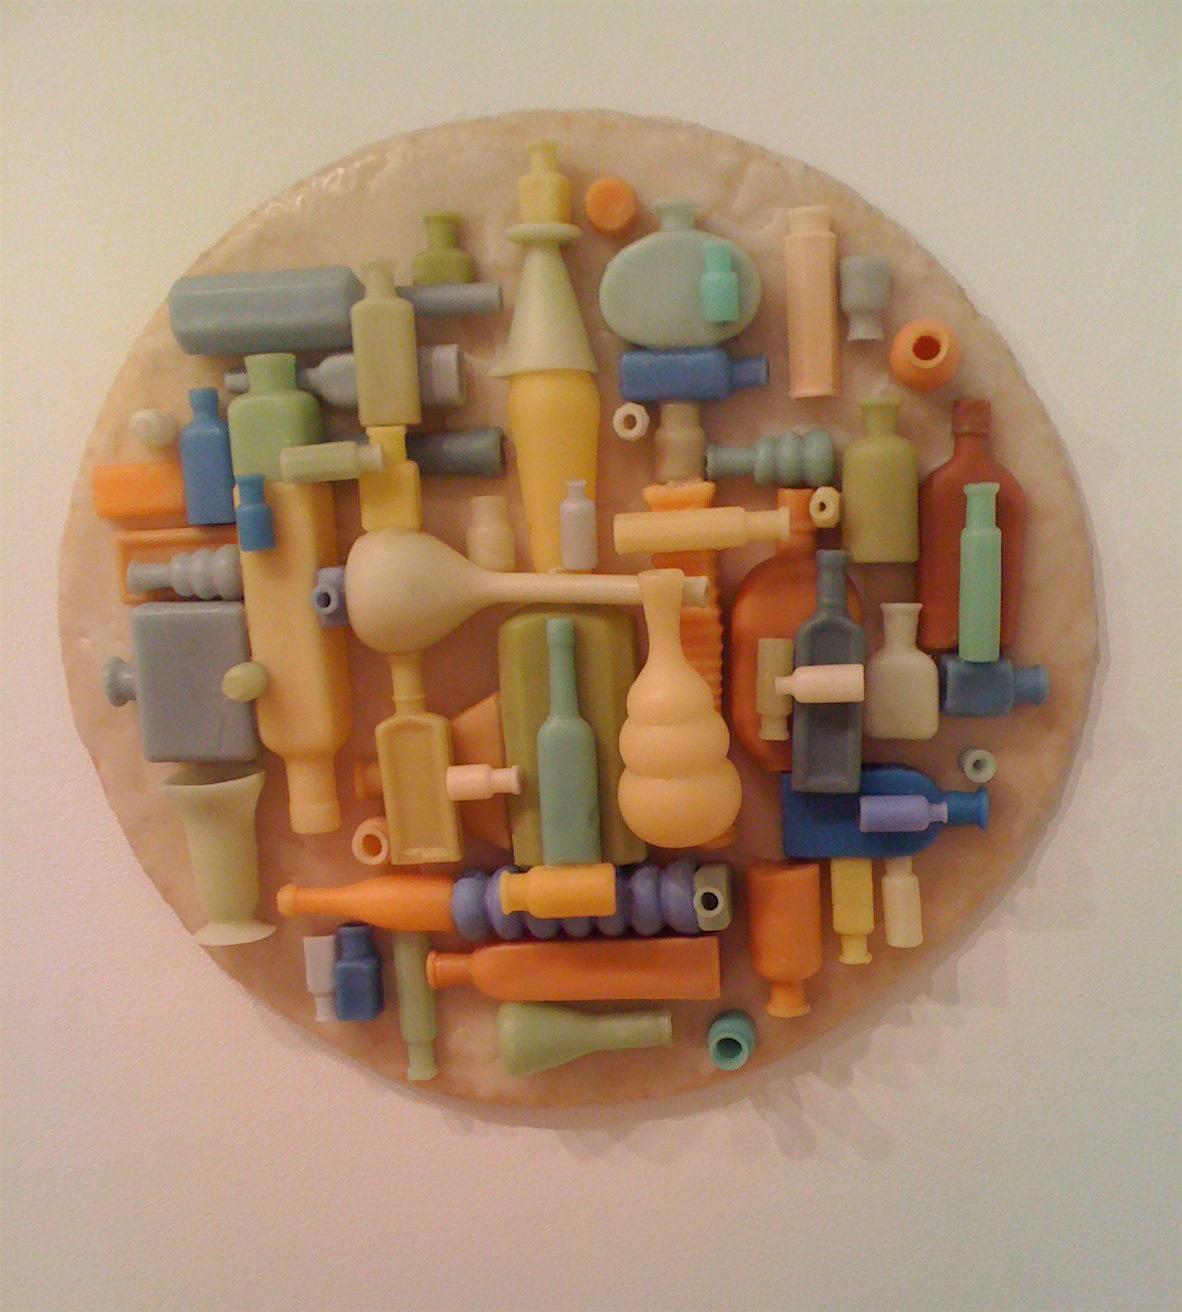 Bottletondo , 2006: beeswax, wood, 25 x 24 inches